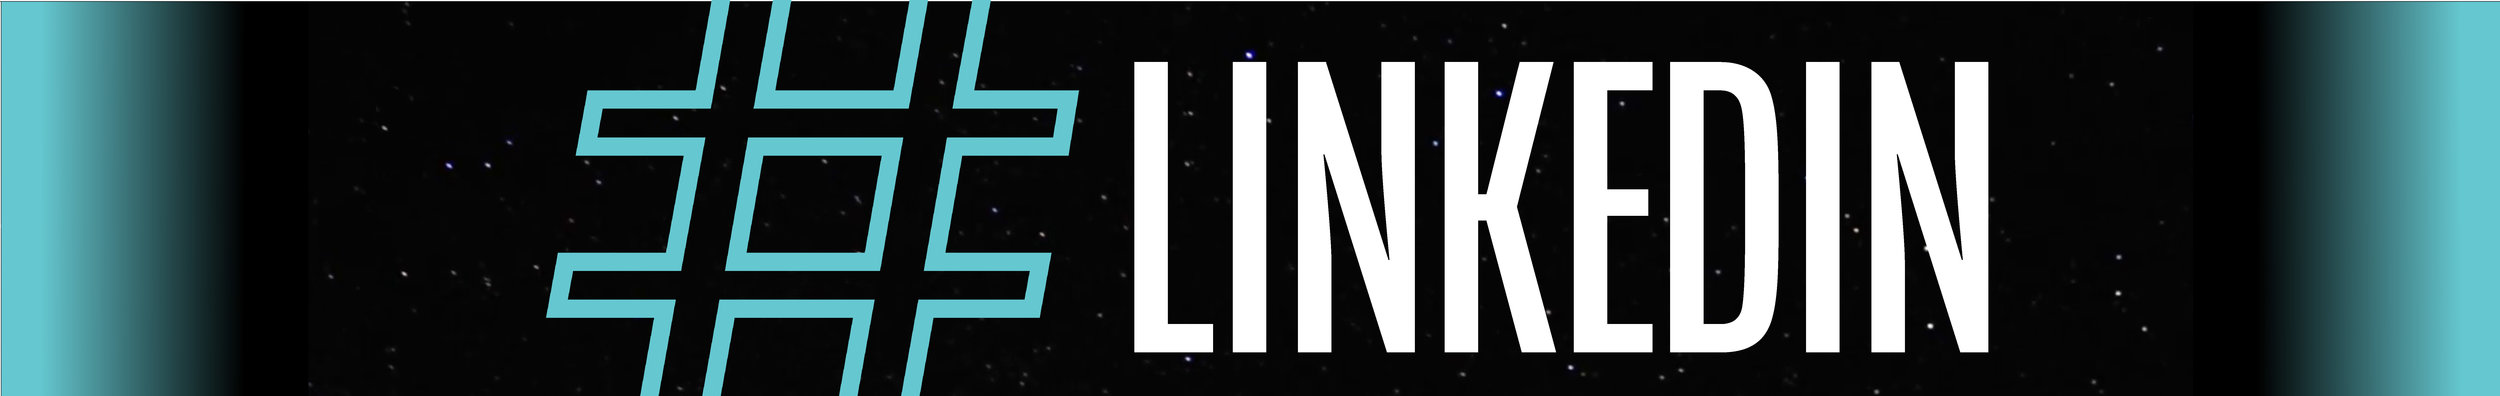 # LINKEDIN BLACK COVER-01-01.jpg